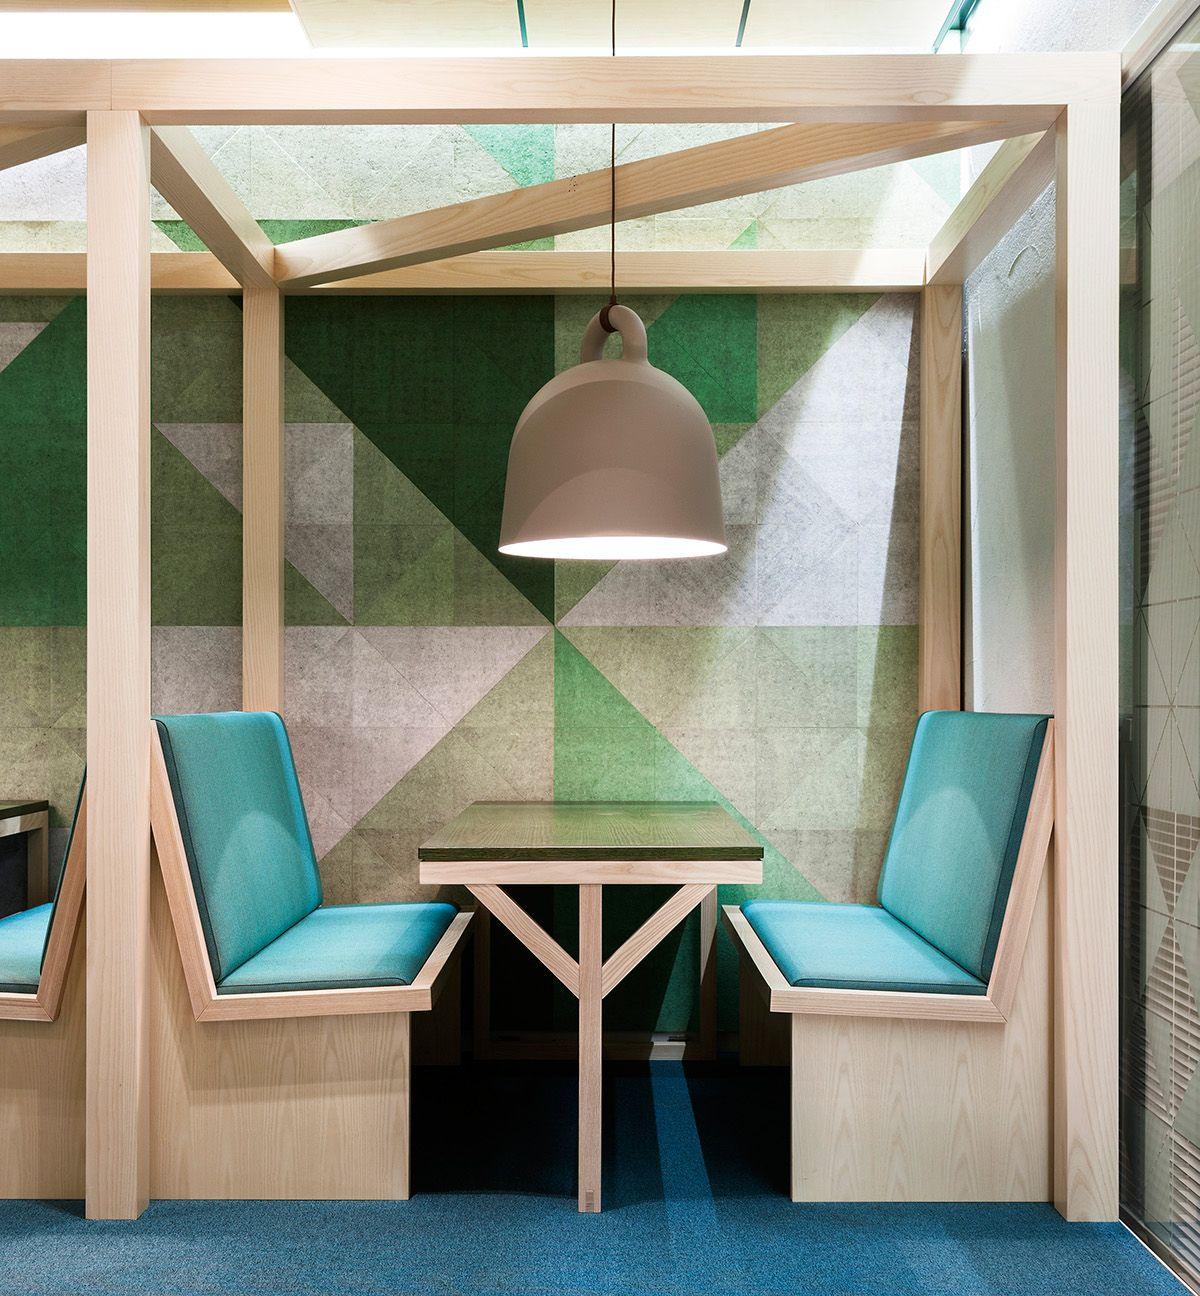 Cafe Banquette Seating: Canteen By Aleksi Hautamäki, BOND Creative Agency